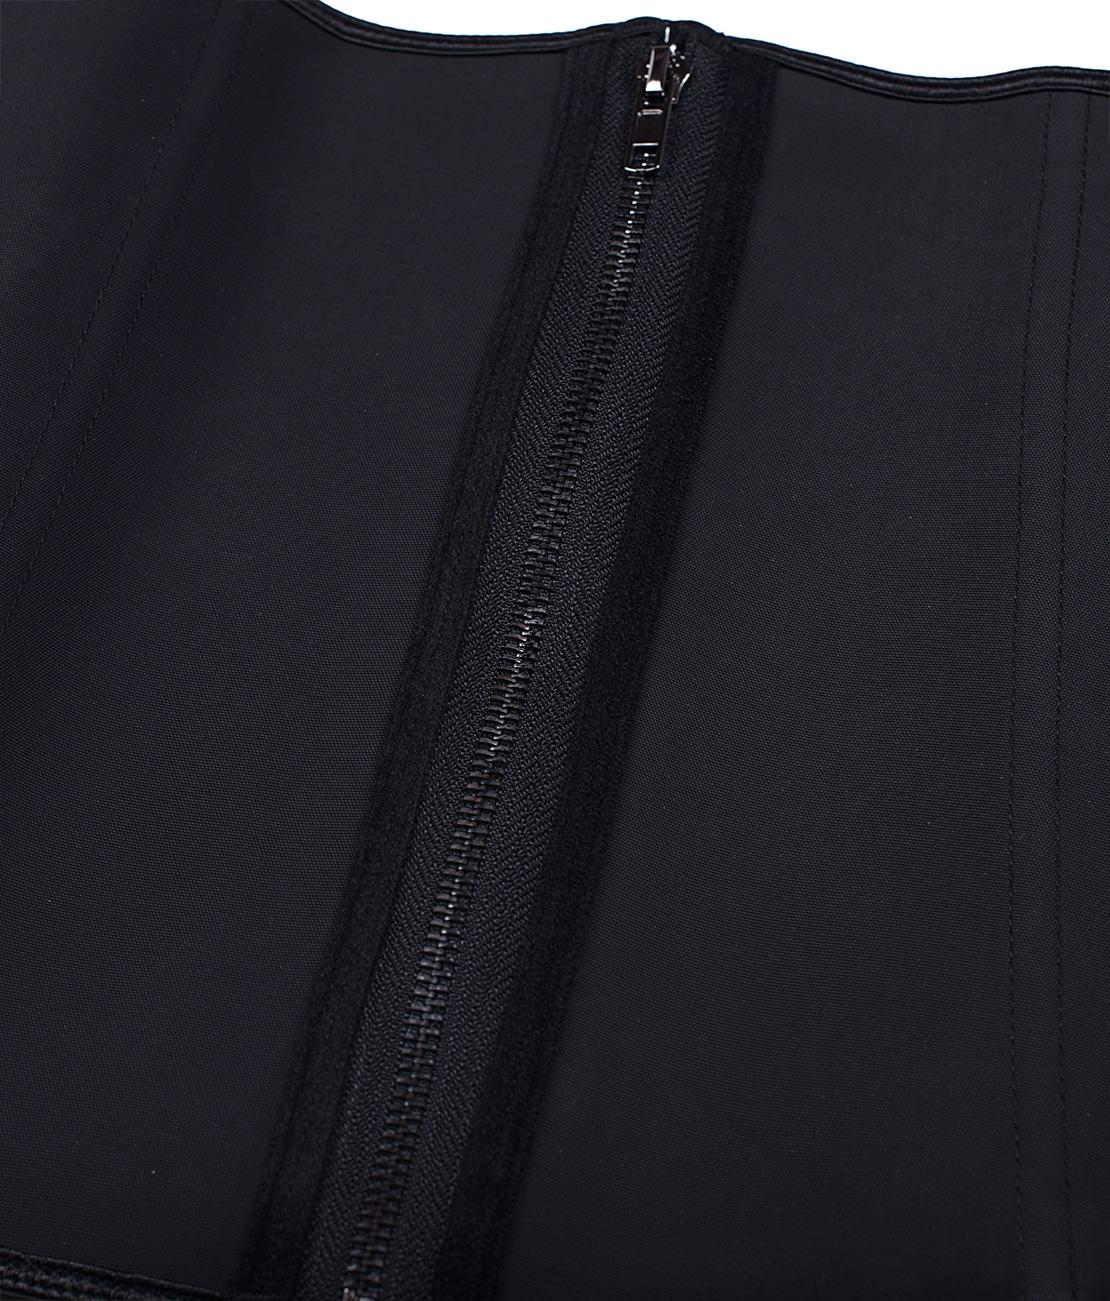 Gaine Femme Noir Packshot Detail 1